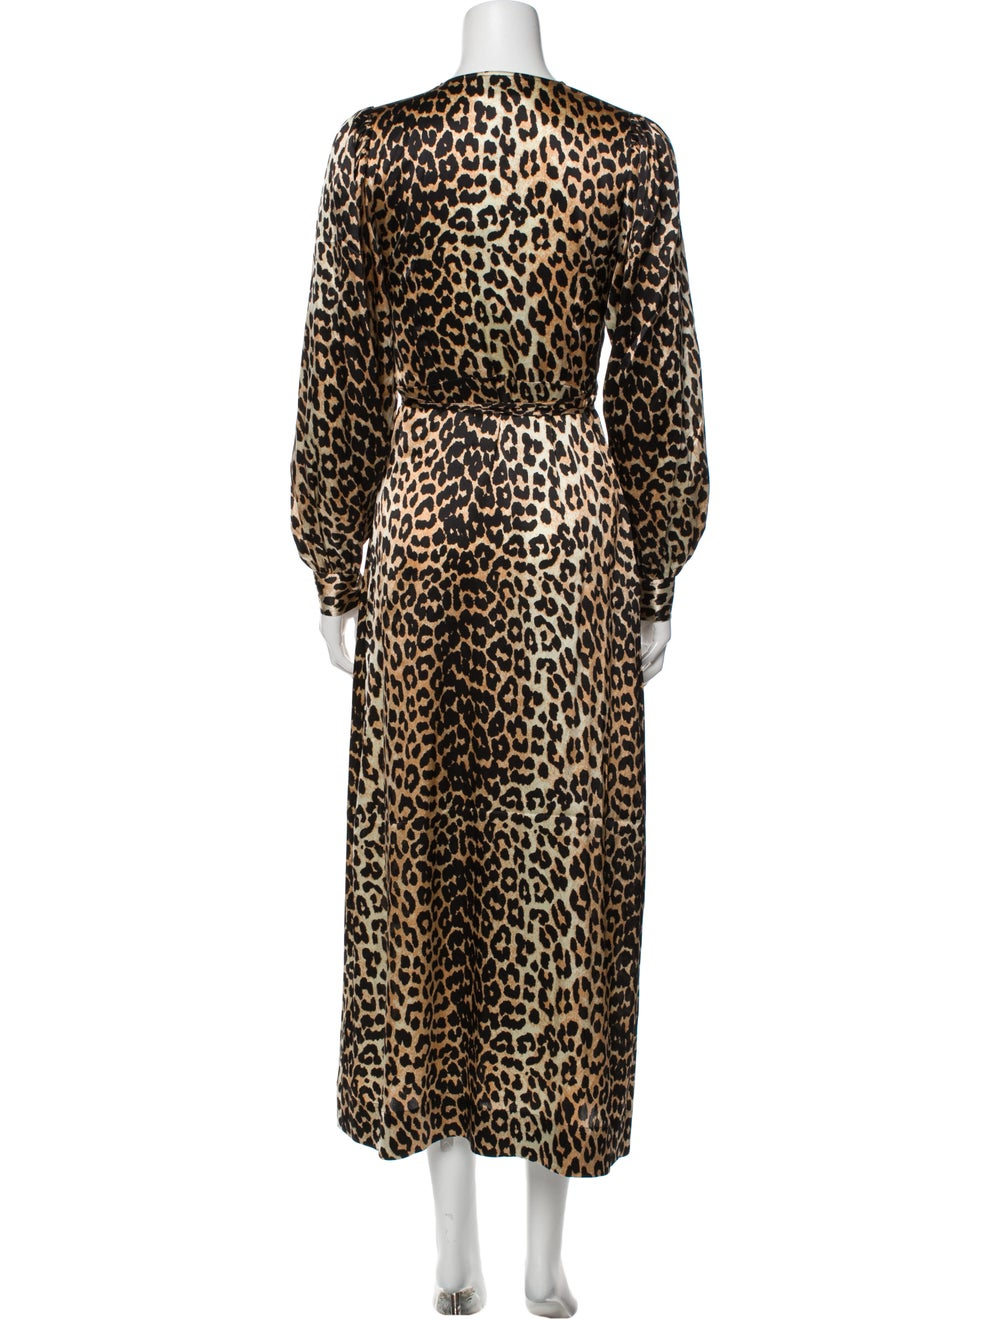 Ganni Silk Long Dress - image 3